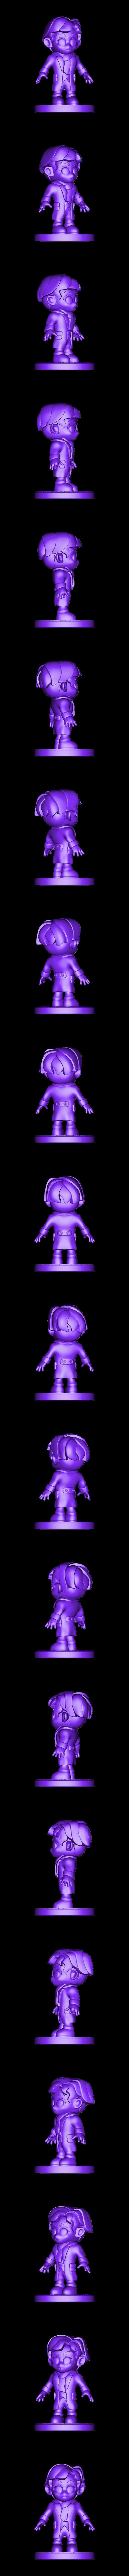 sherlock.stl Descargar archivo STL Sherlock Holmes Chibi • Modelo imprimible en 3D, MatteoMoscatelli